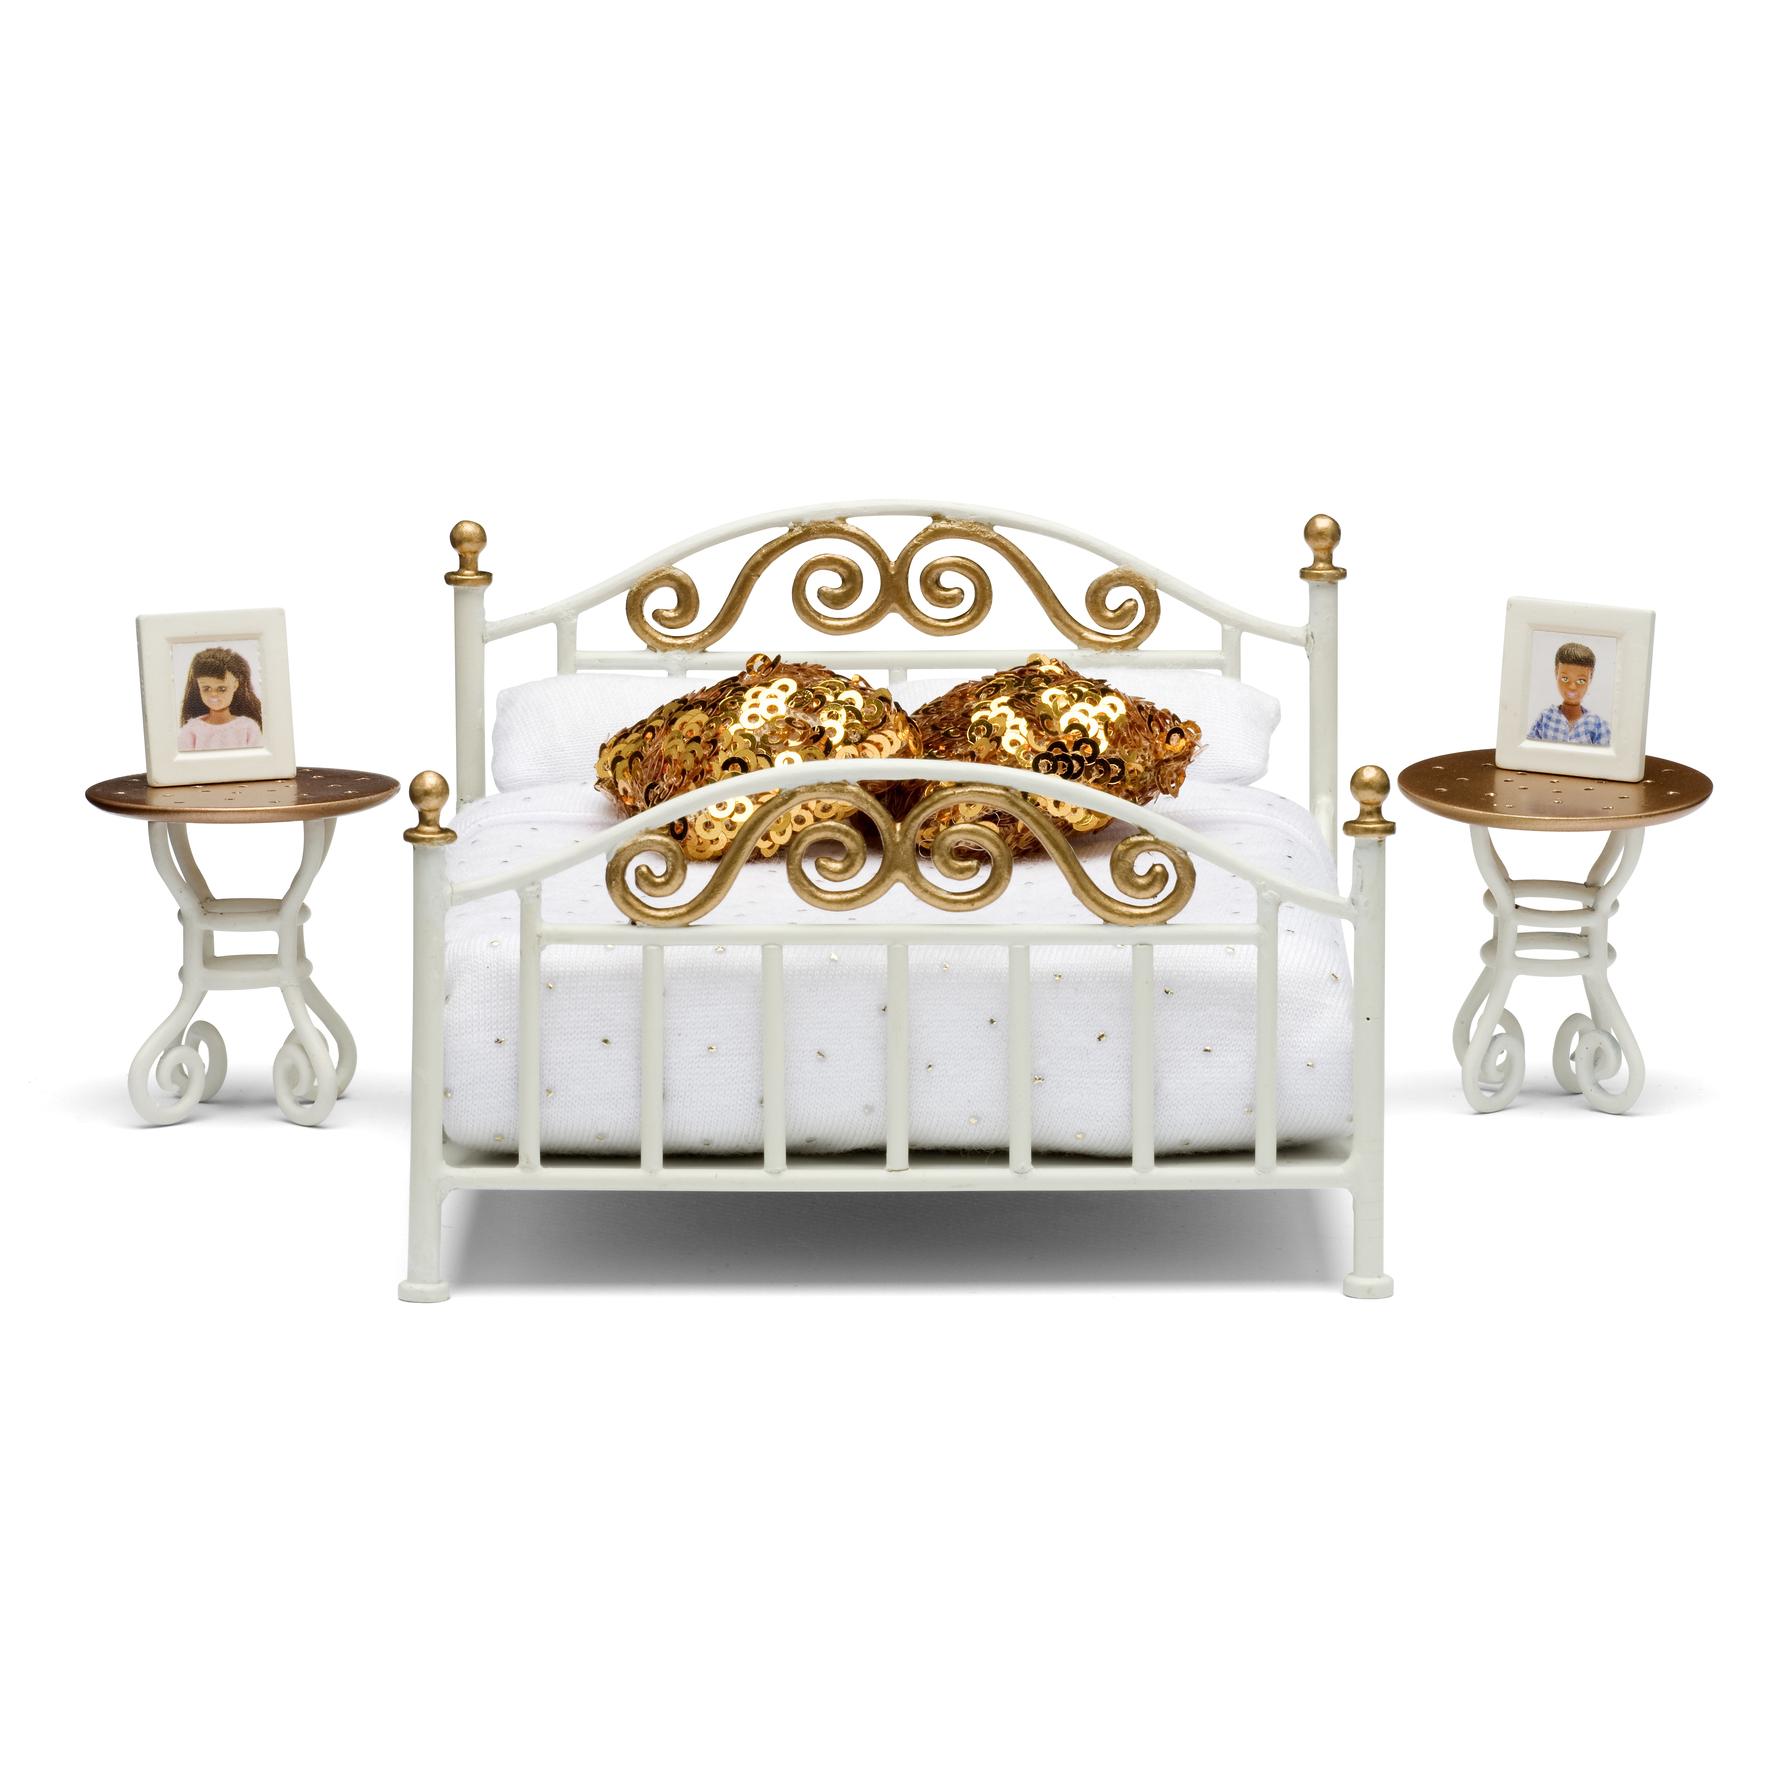 Набор Lundby мебели для домика Смоланд Спальня